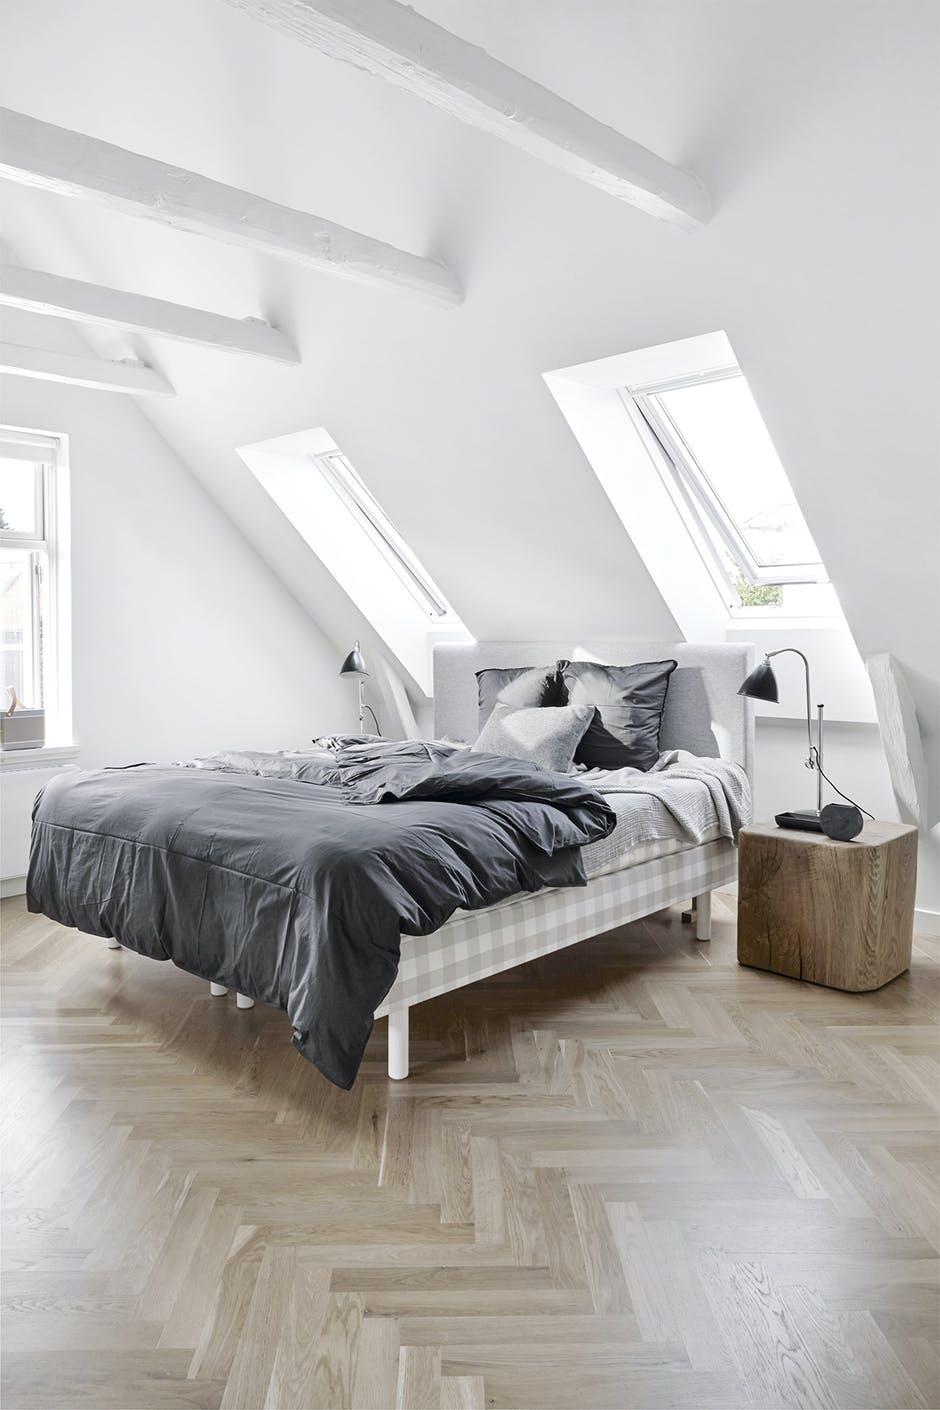 Mooie en suite badkamer van Deense ontwerpster Kathrine Espersen